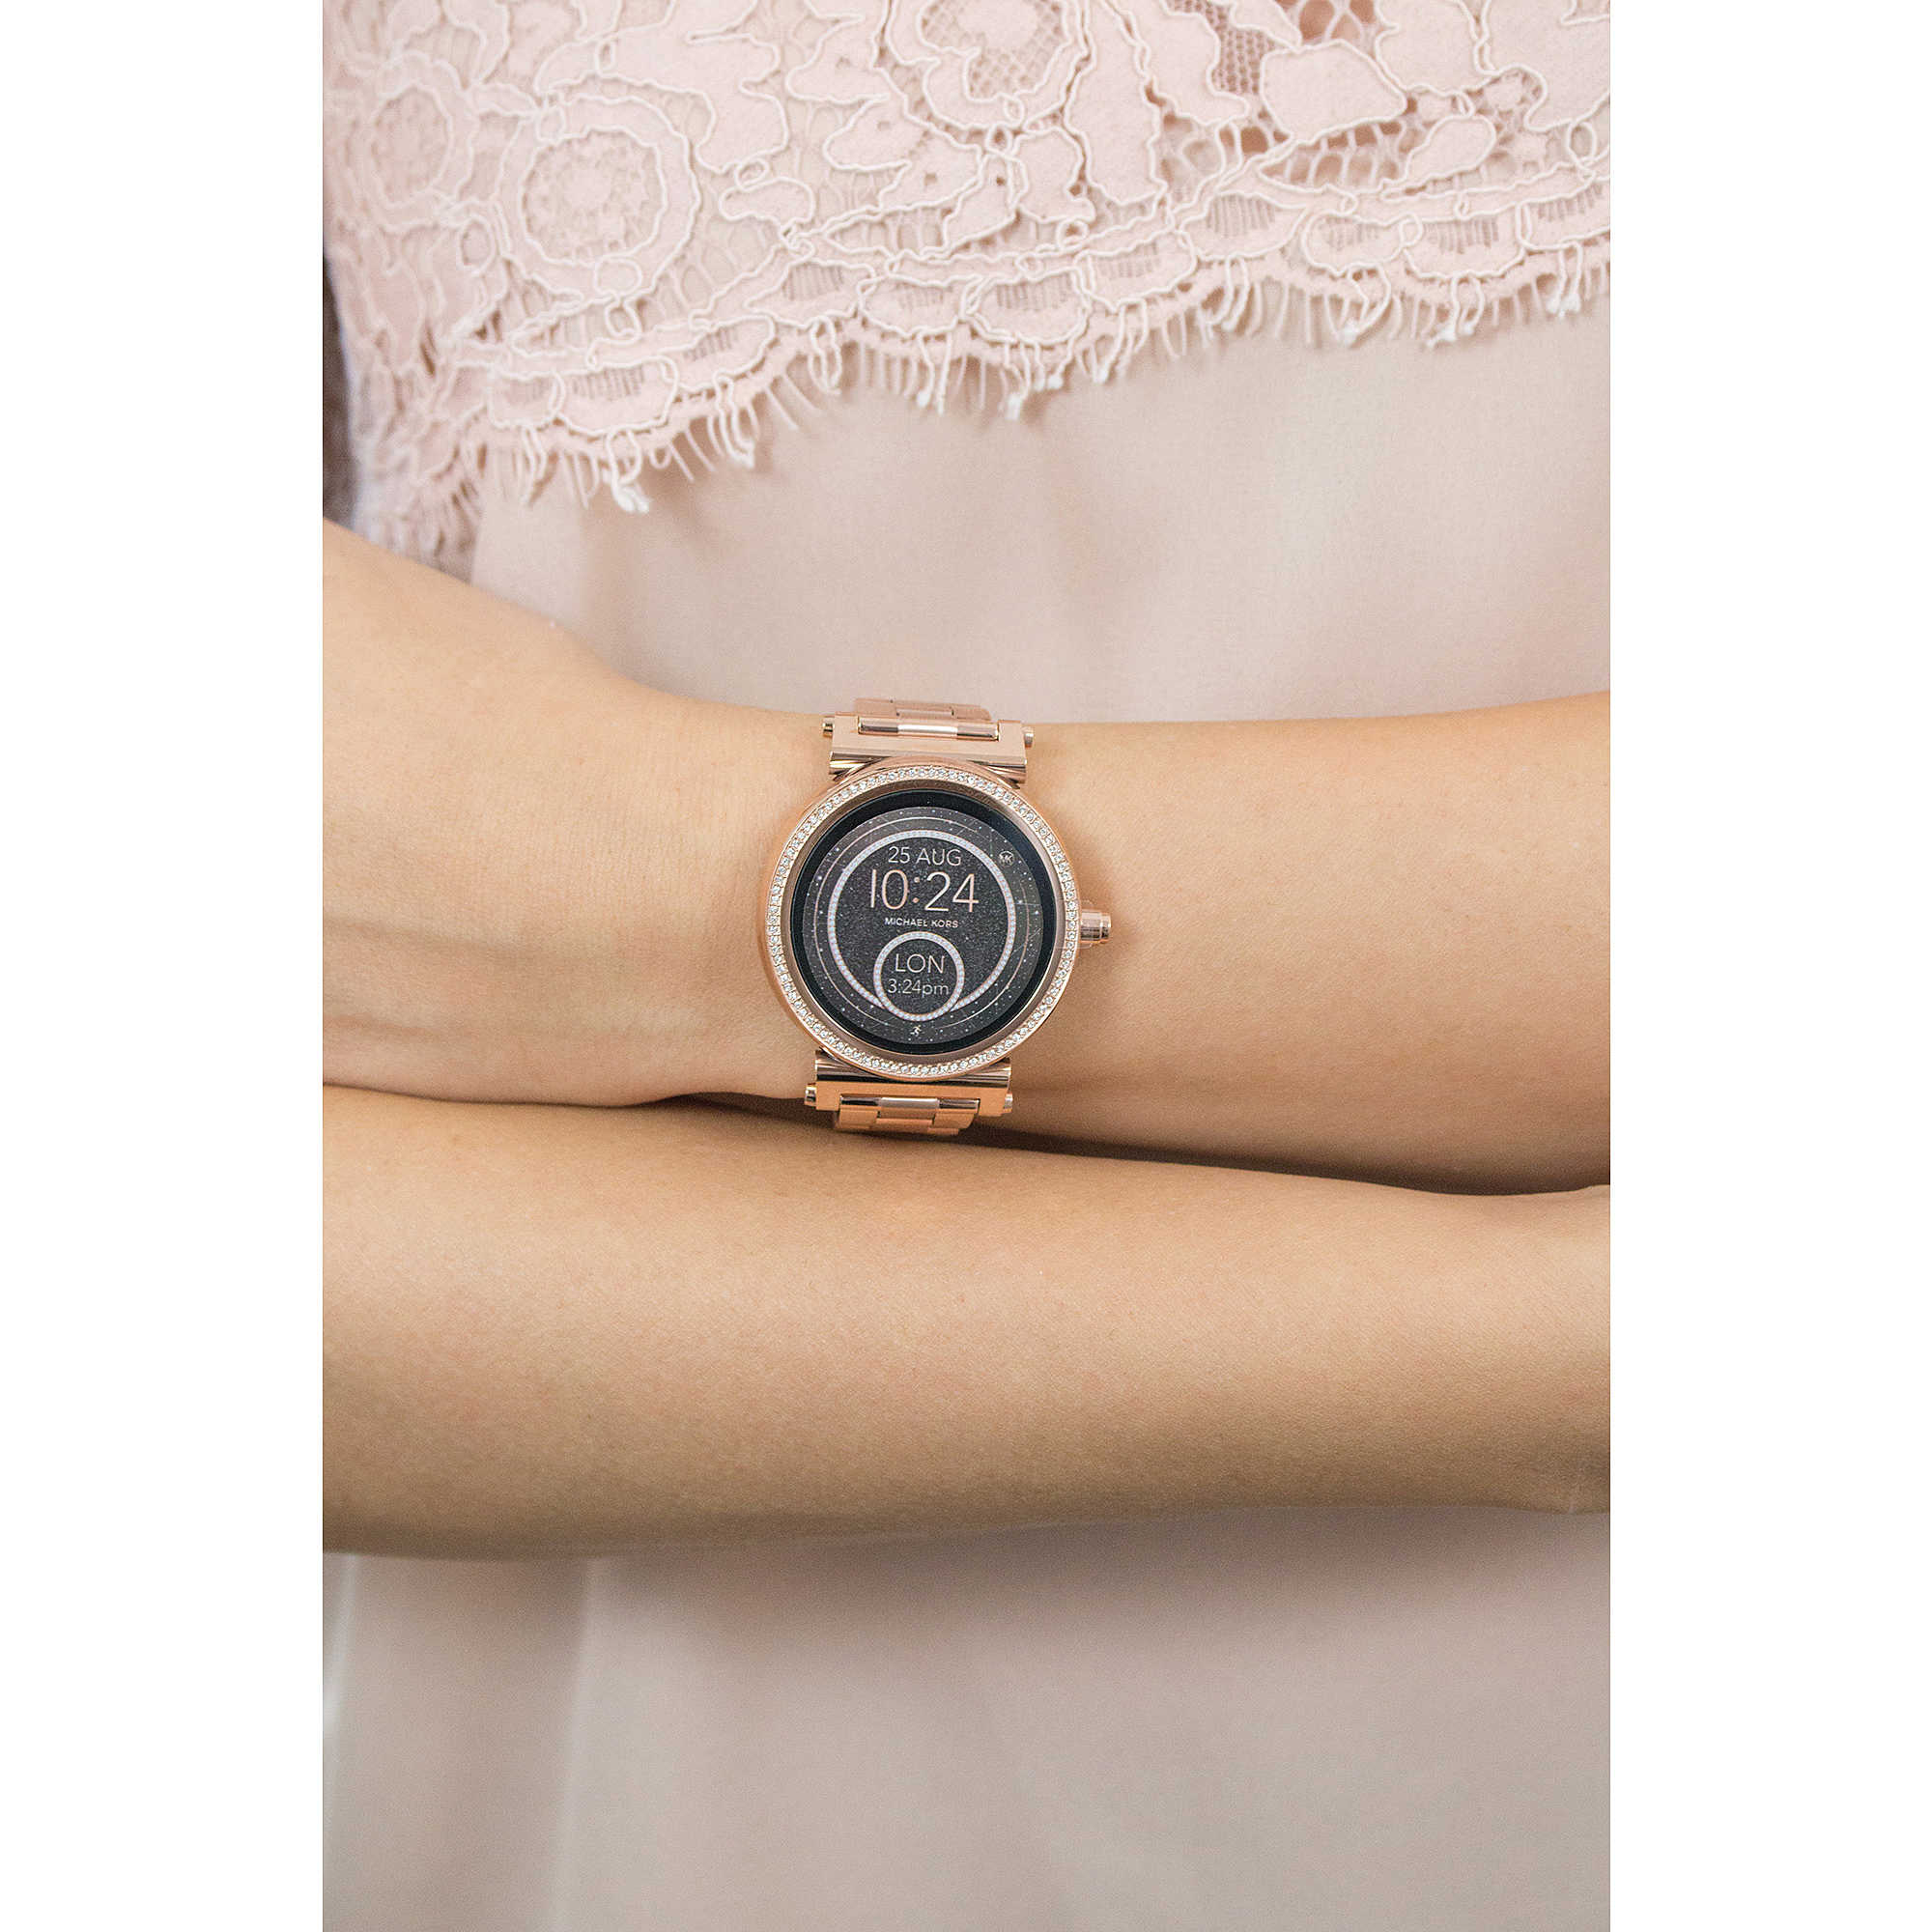 Uhr Smartwatch Frau Michael Kors Sofie Mkt5022 Smartwatches Michael Kors